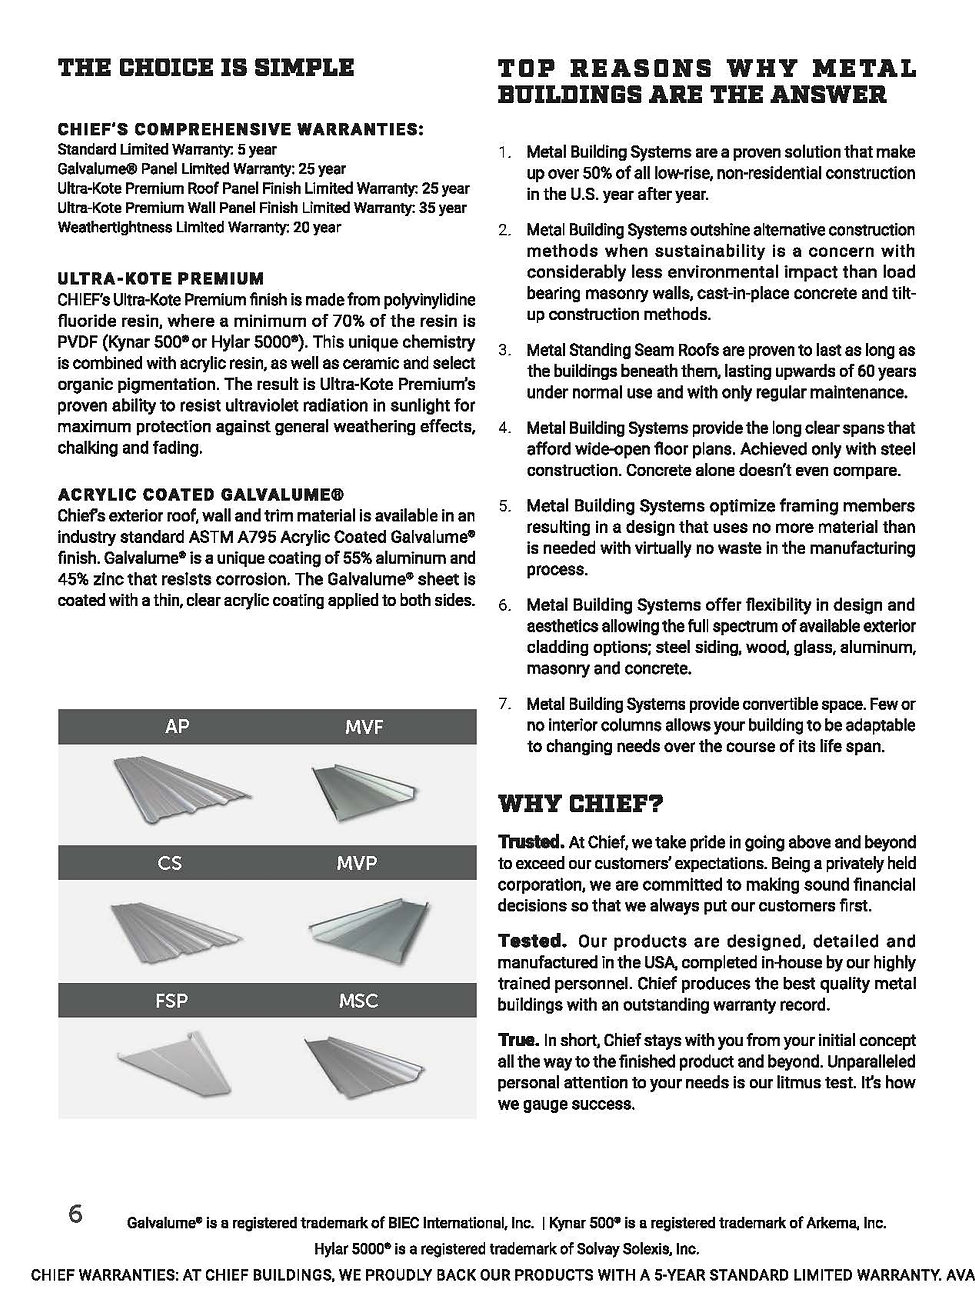 MetalBuildingApplicationsupdated_Page_6.